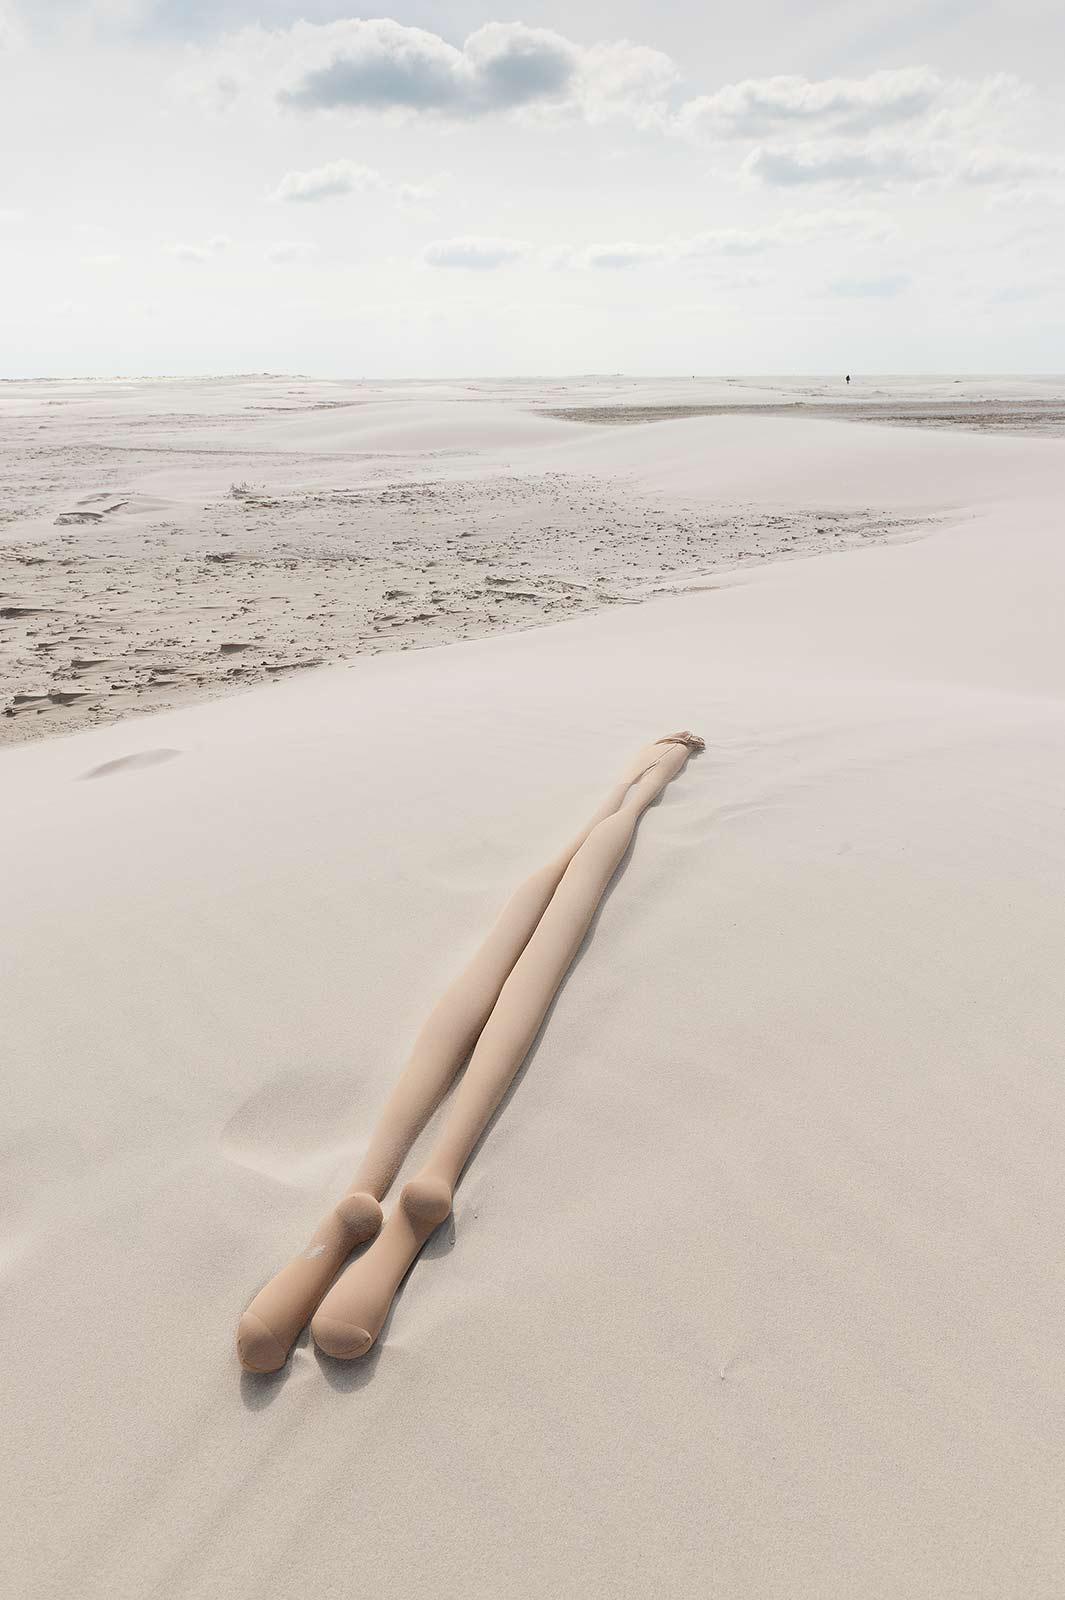 fabian_matz_2017_shaped_bodies_sand_polyamide_tights_14